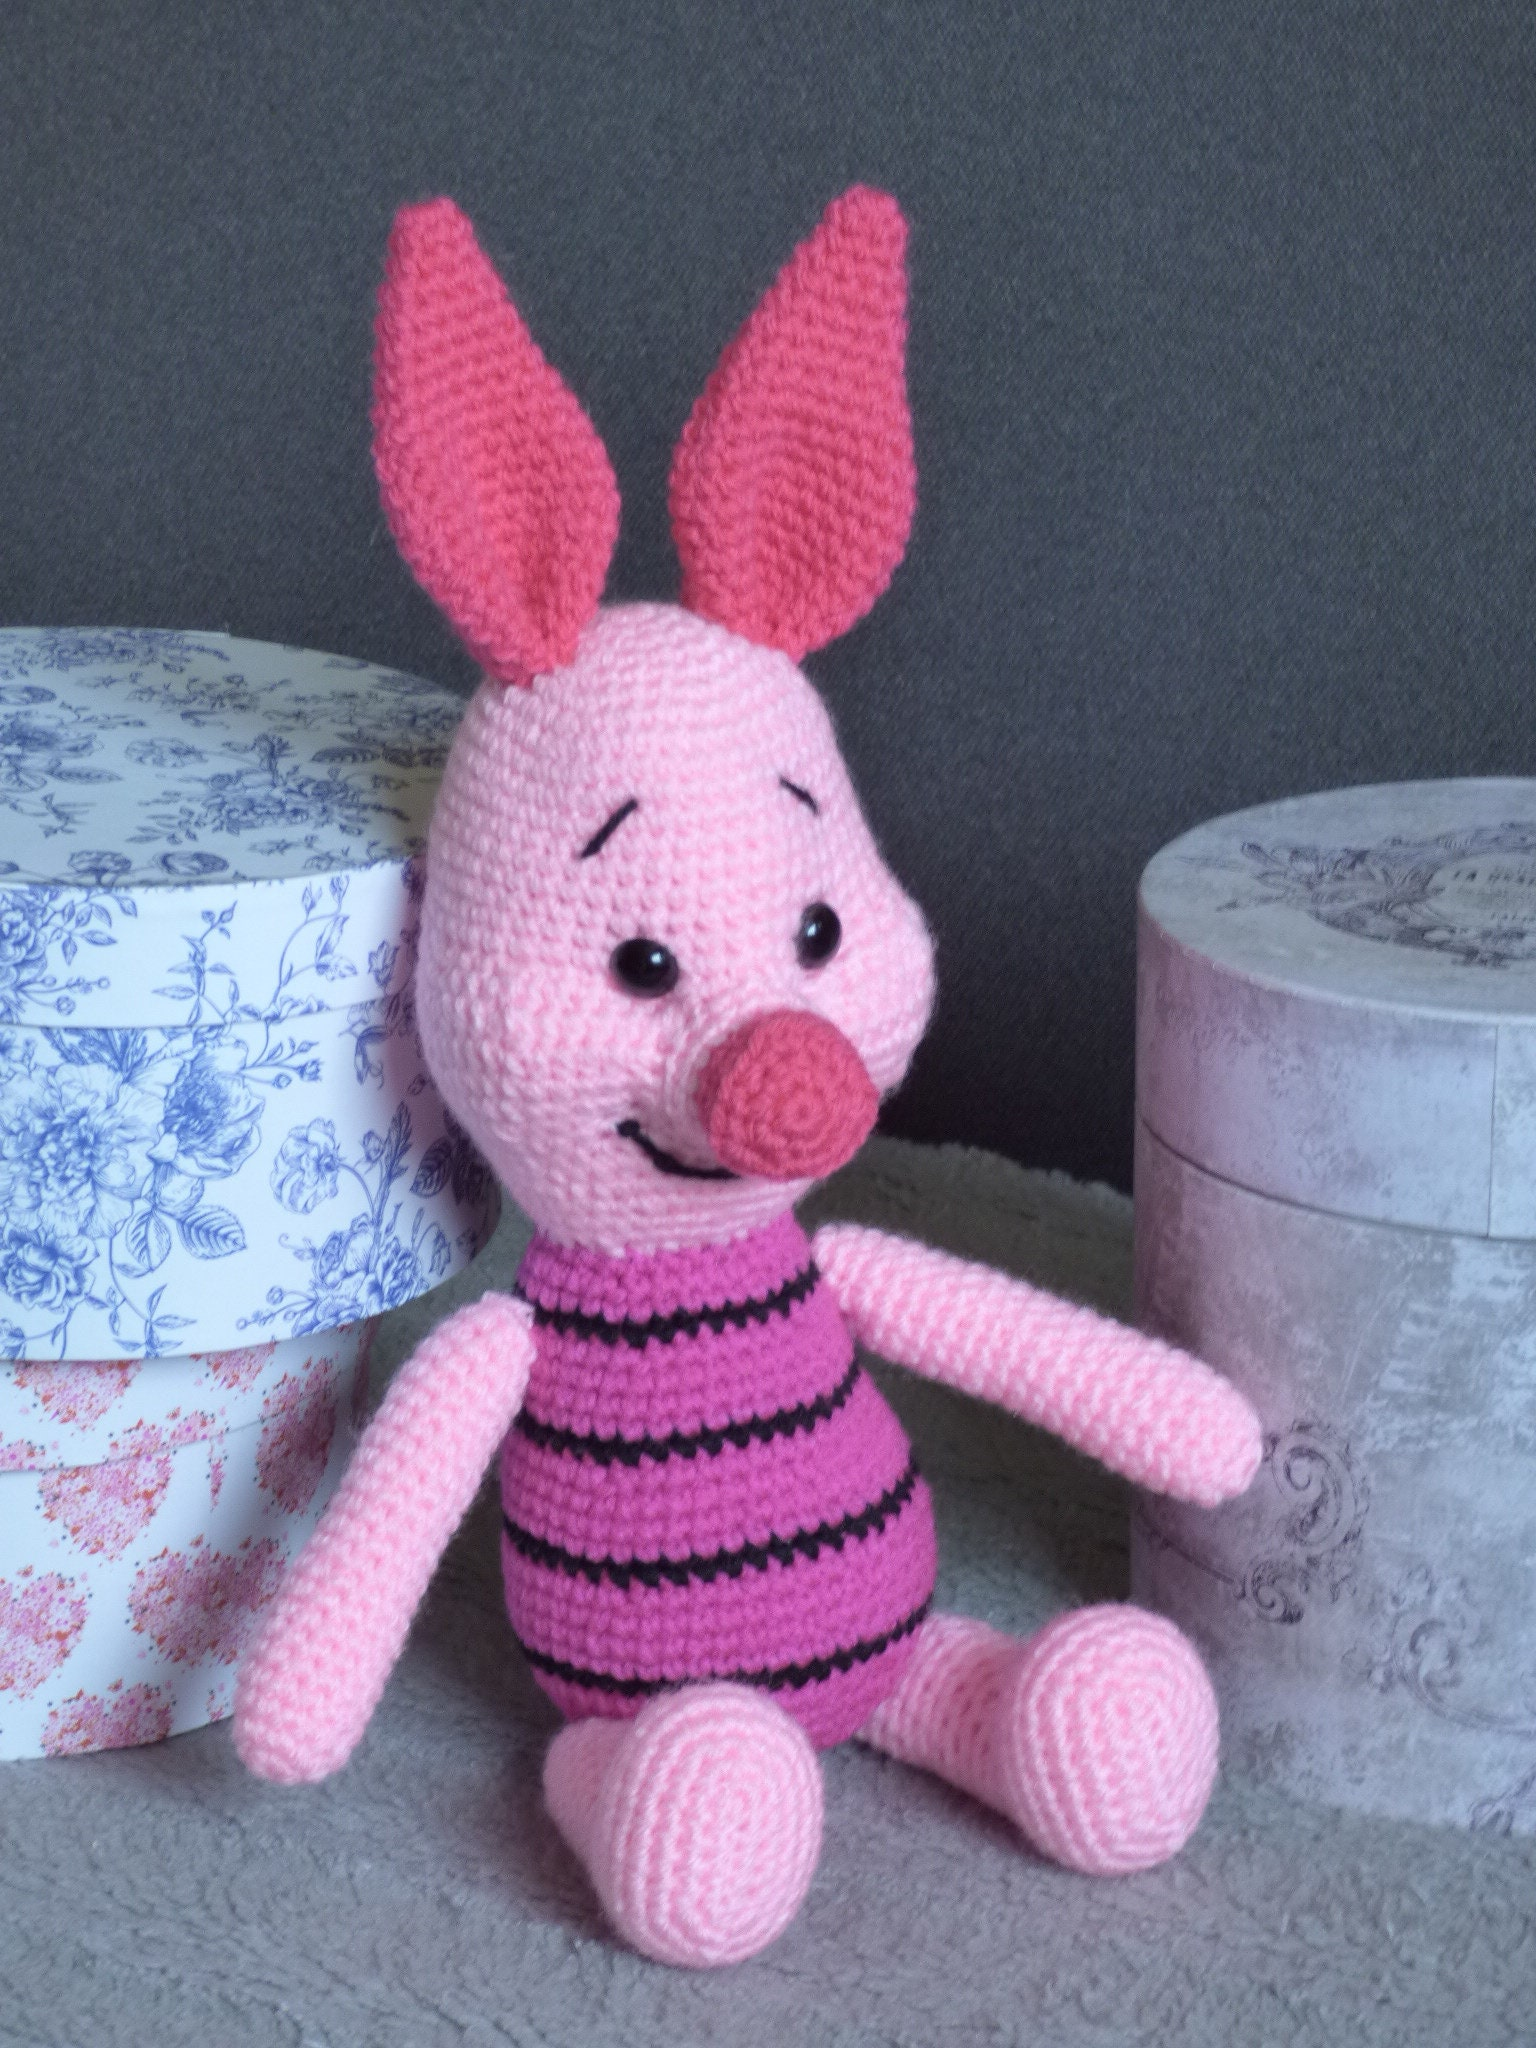 Piglet Piglet Crochet Doll Piglet Amigurumi Winnie The Pooh